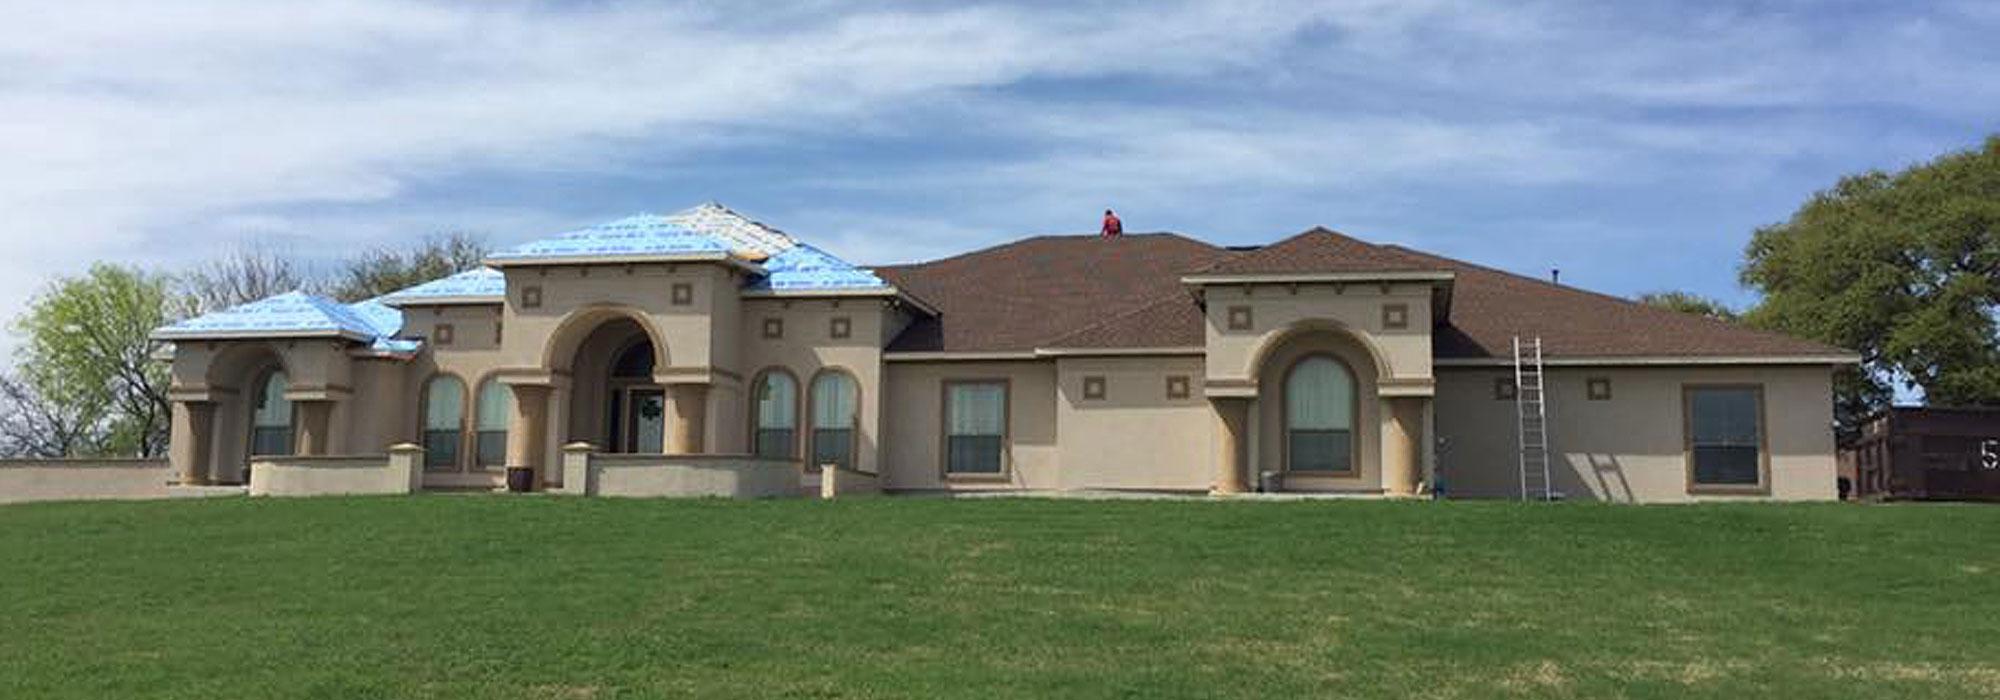 La Vernia Roofing Services